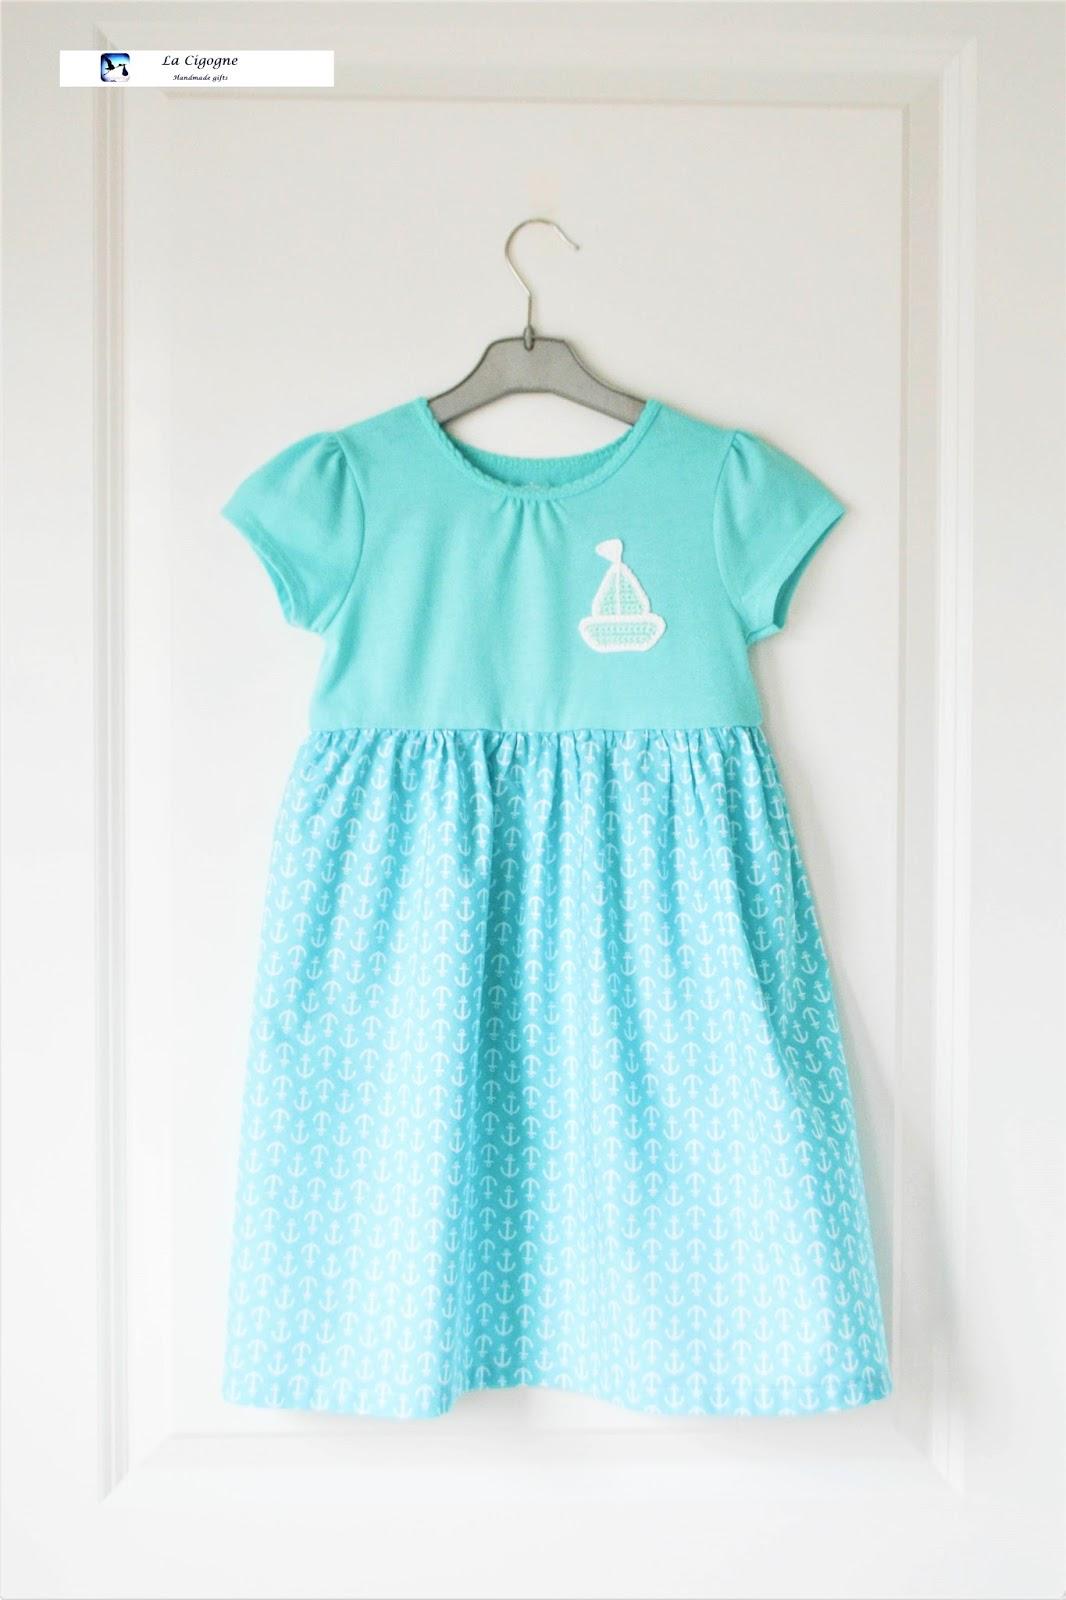 La Cigogne Free Pattern Of Crochet Sailboat And Blue Toddlers Dress